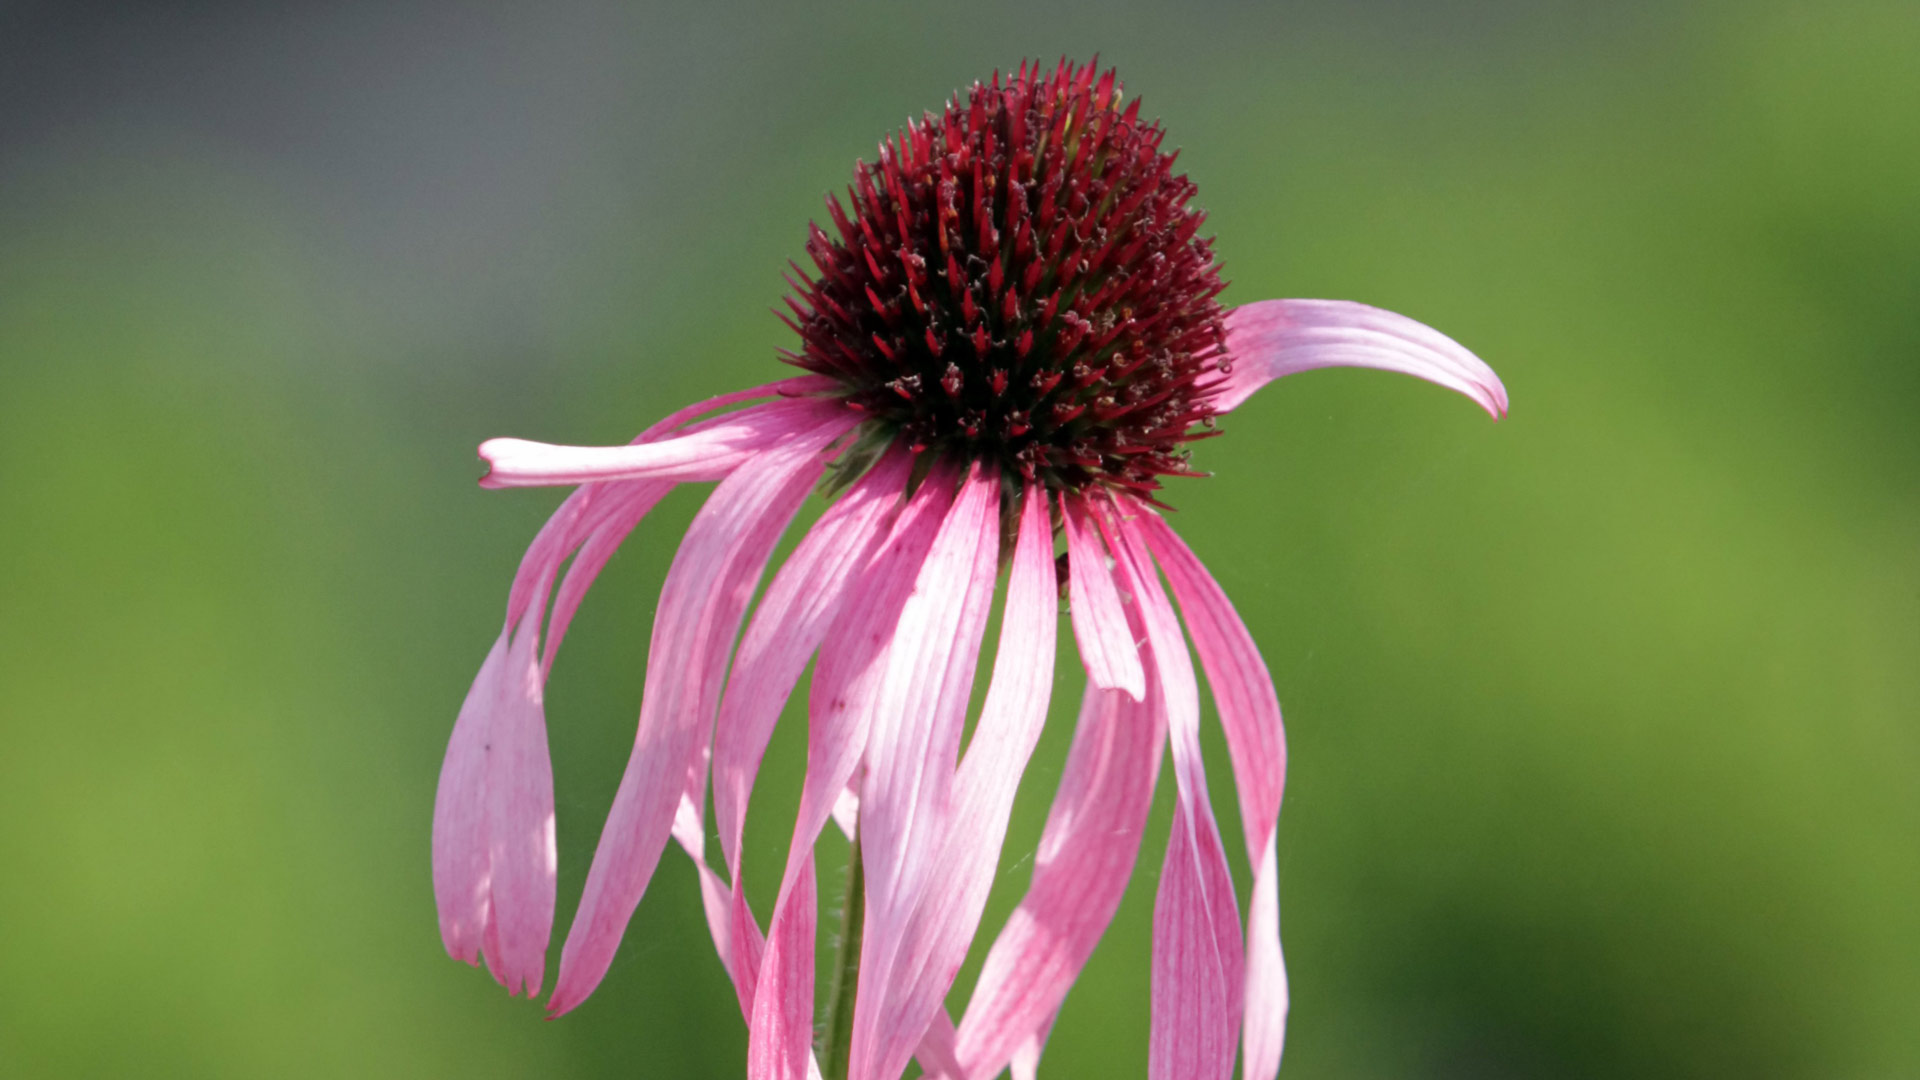 Several echinacea purpurea flowers, also known as sundown or coneflowers